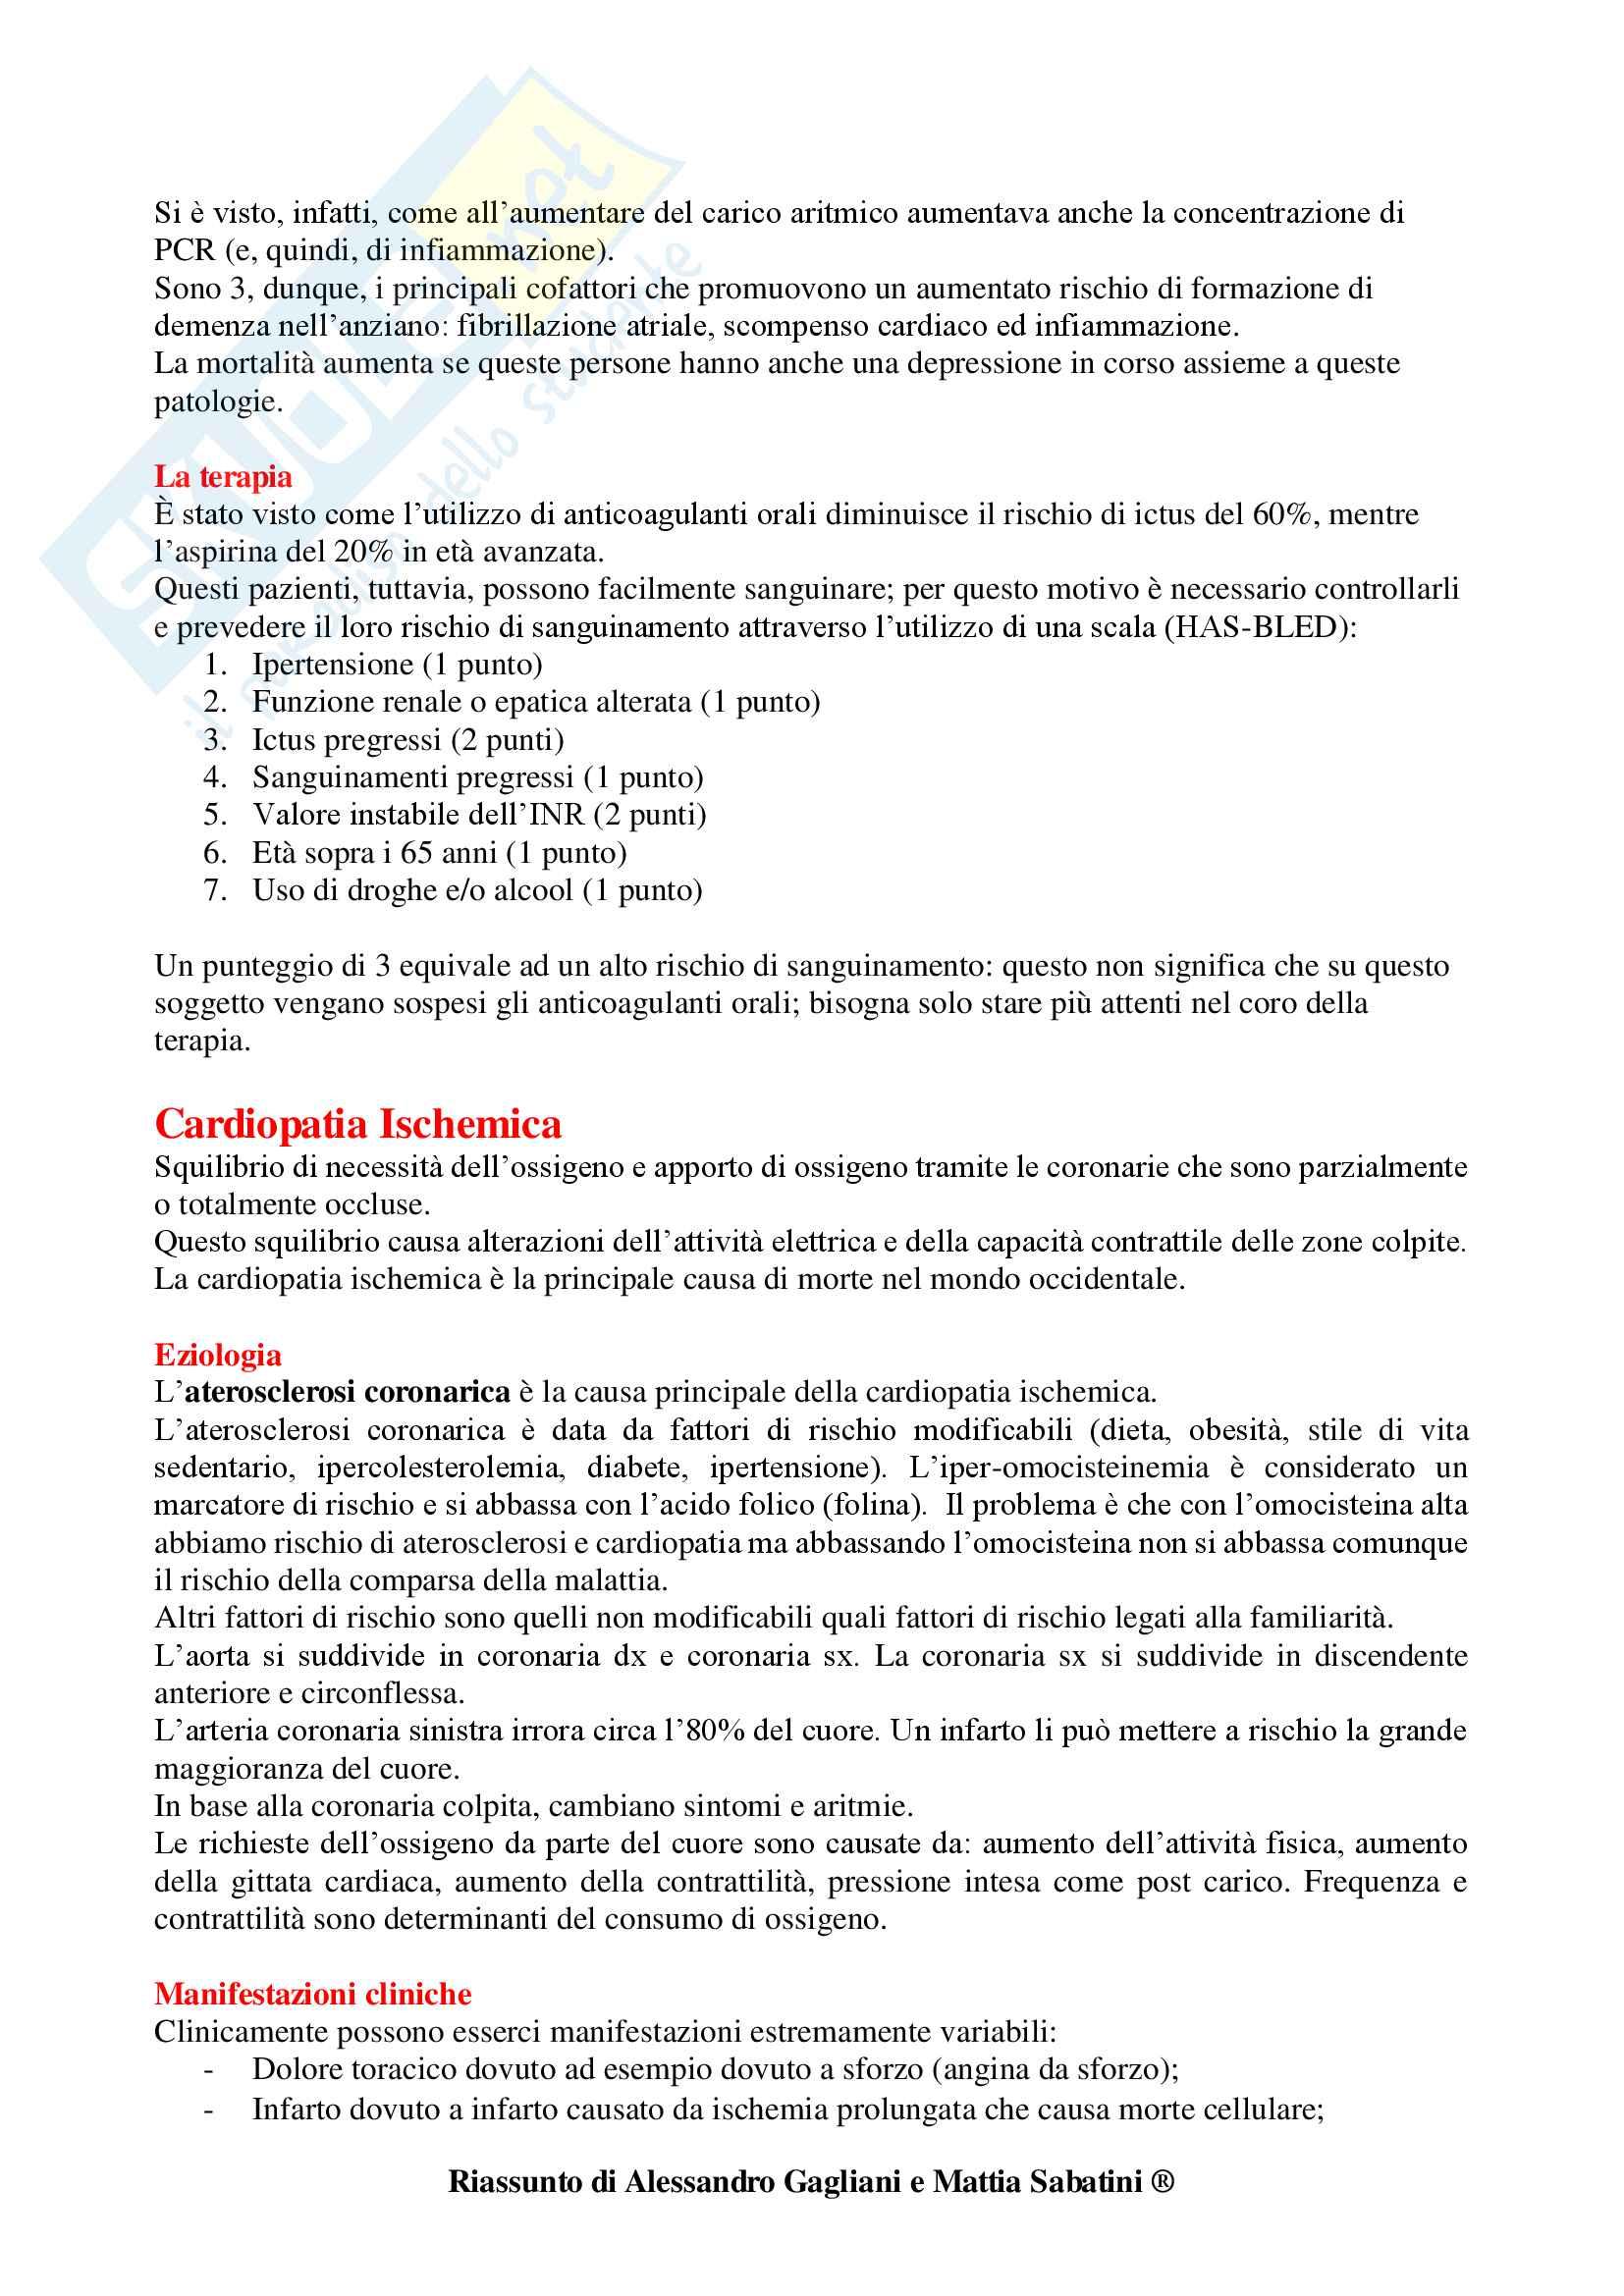 Geriatria - Appunti Completi Pag. 16